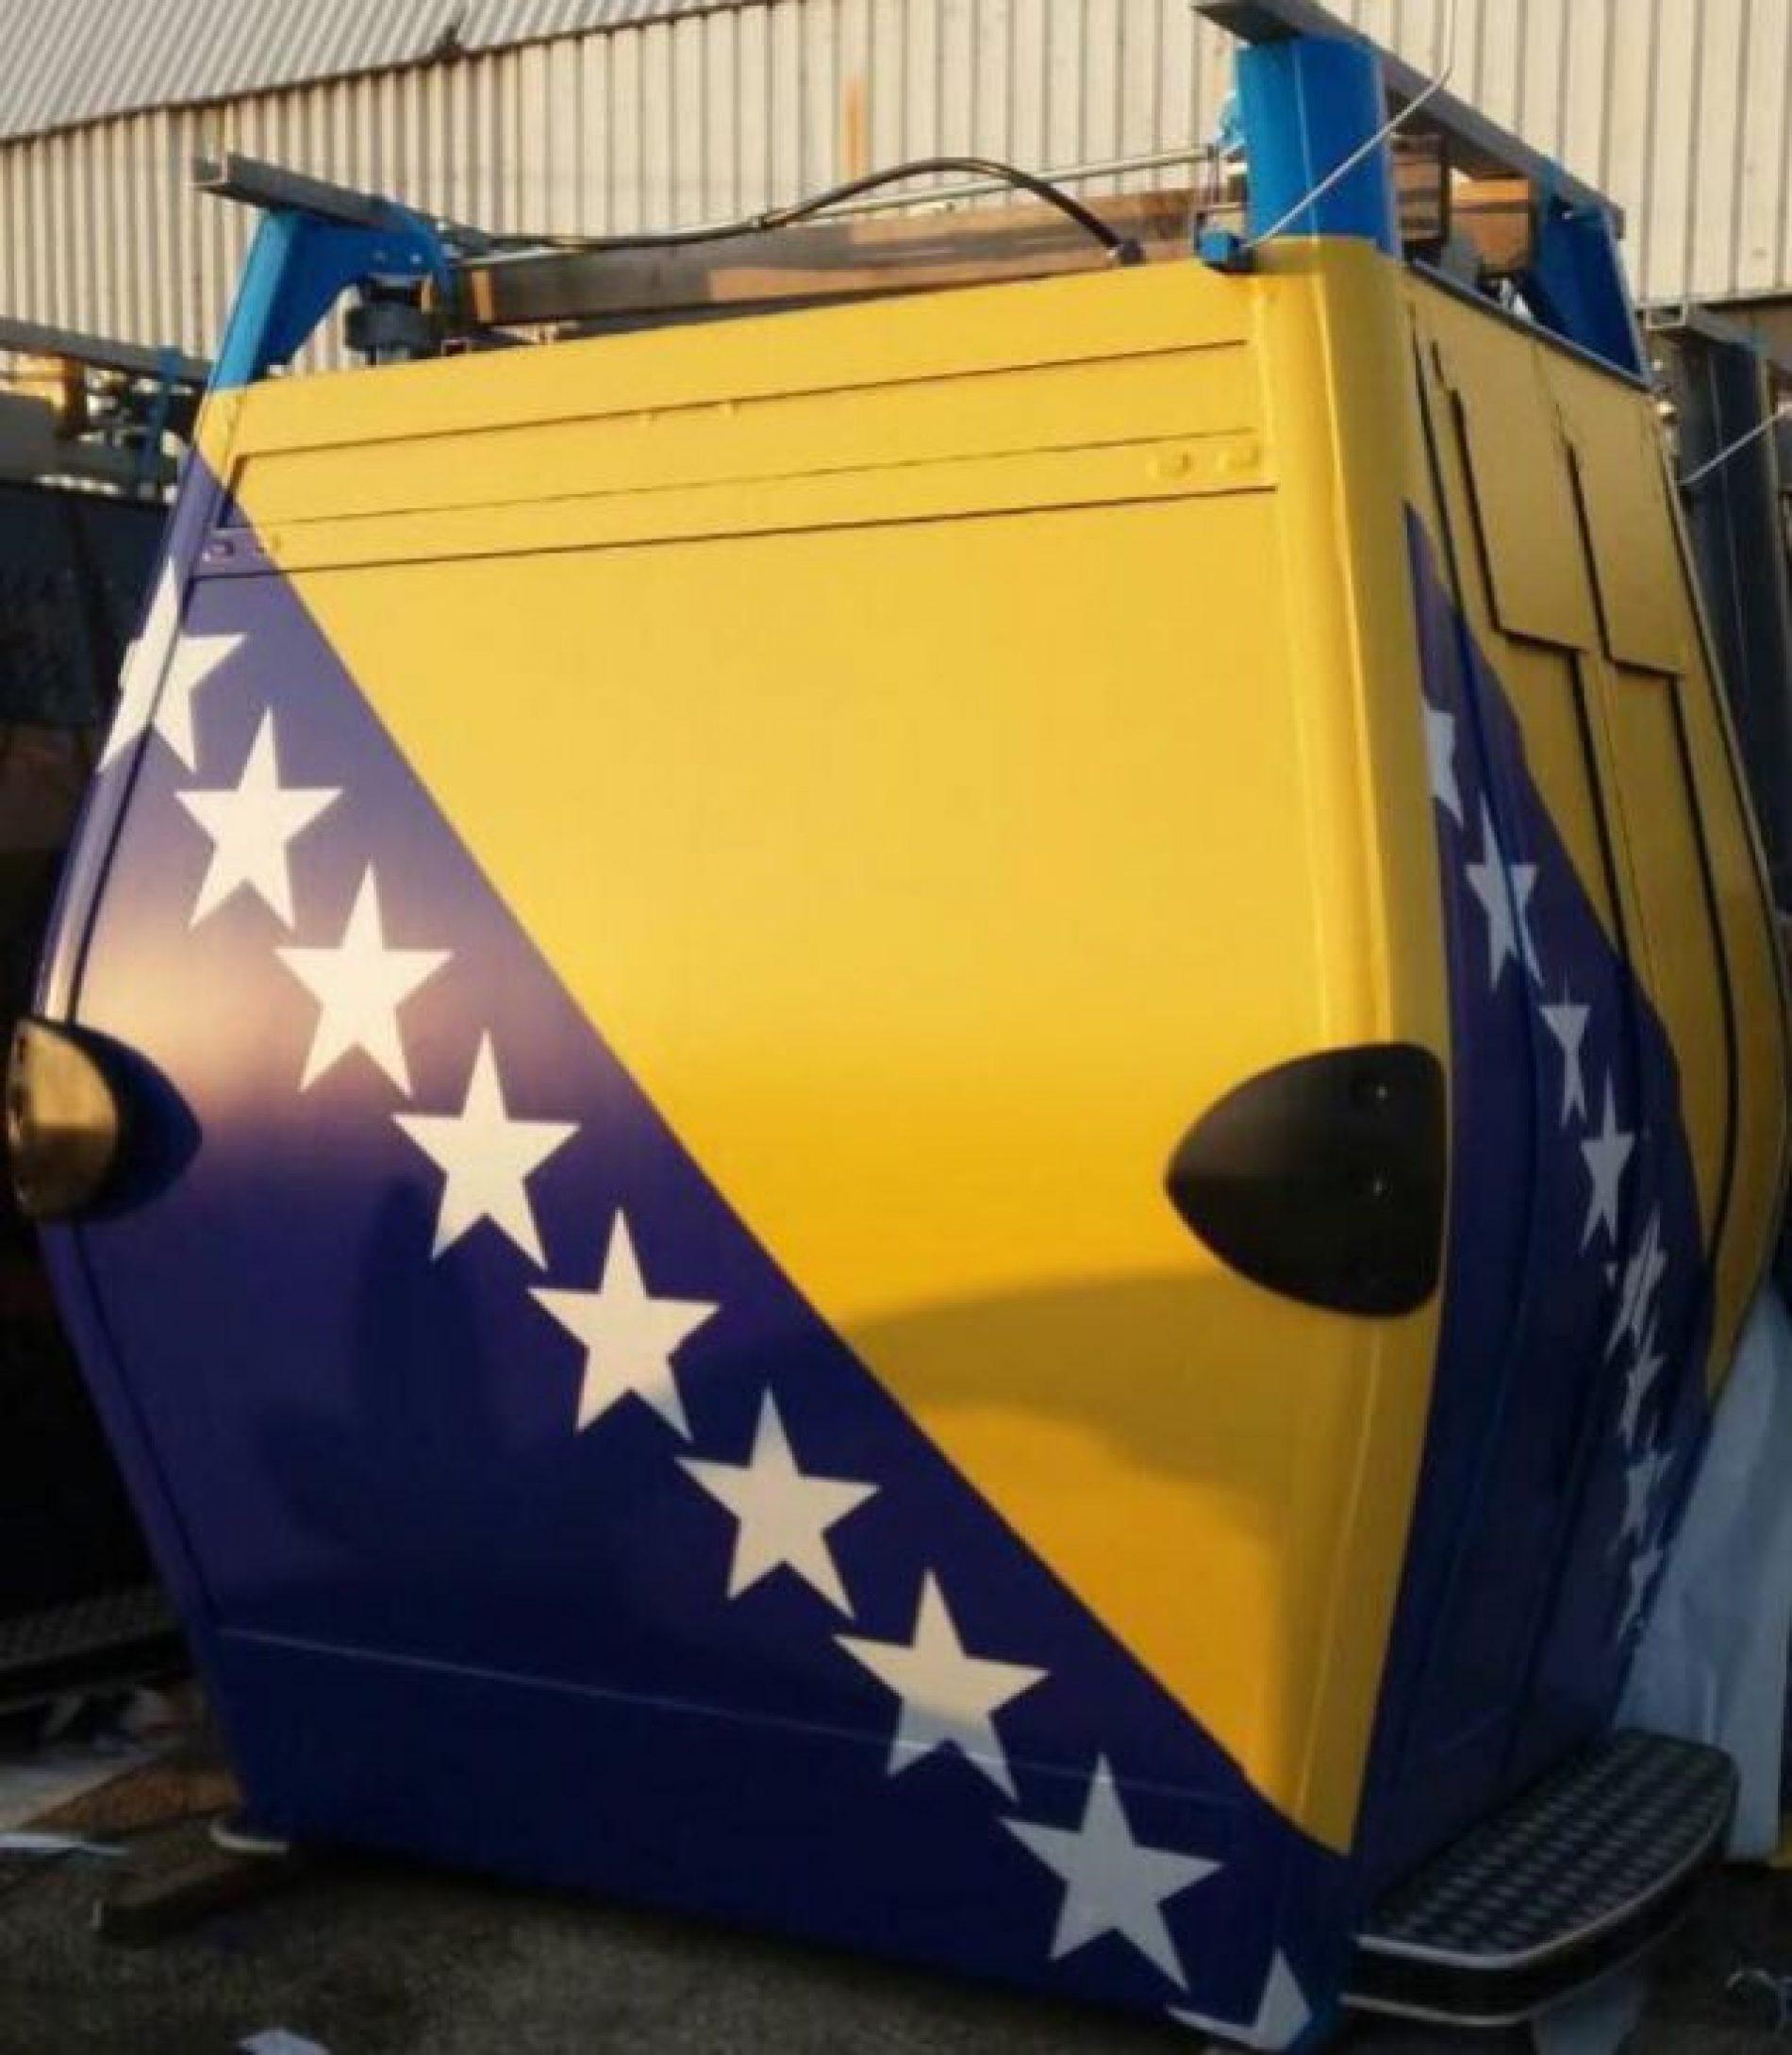 Spremne gondole za Trebevićku žičaru: Sutra prva testna vožnja